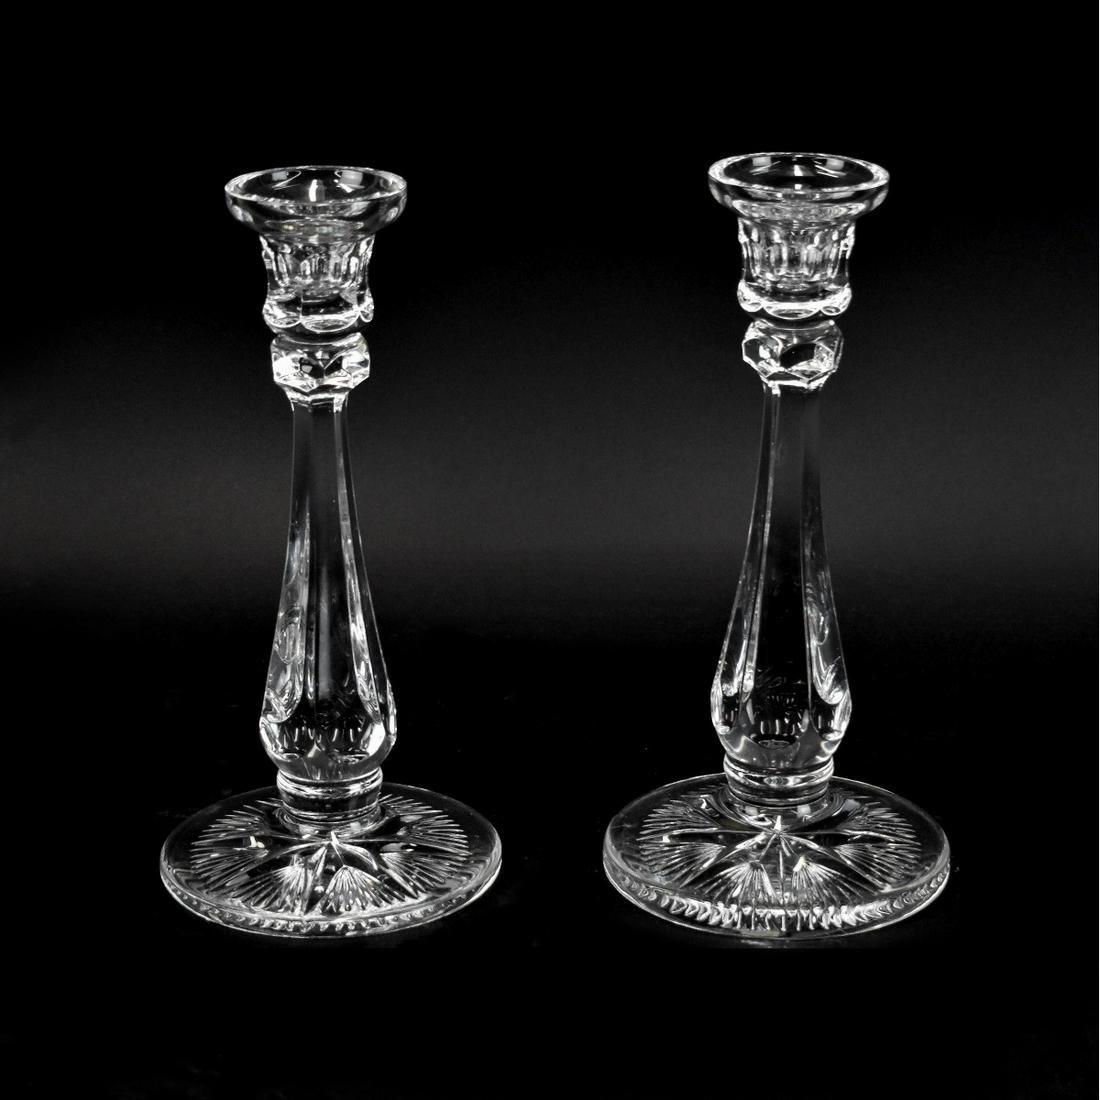 Pair of William Yeoward Candlesticks